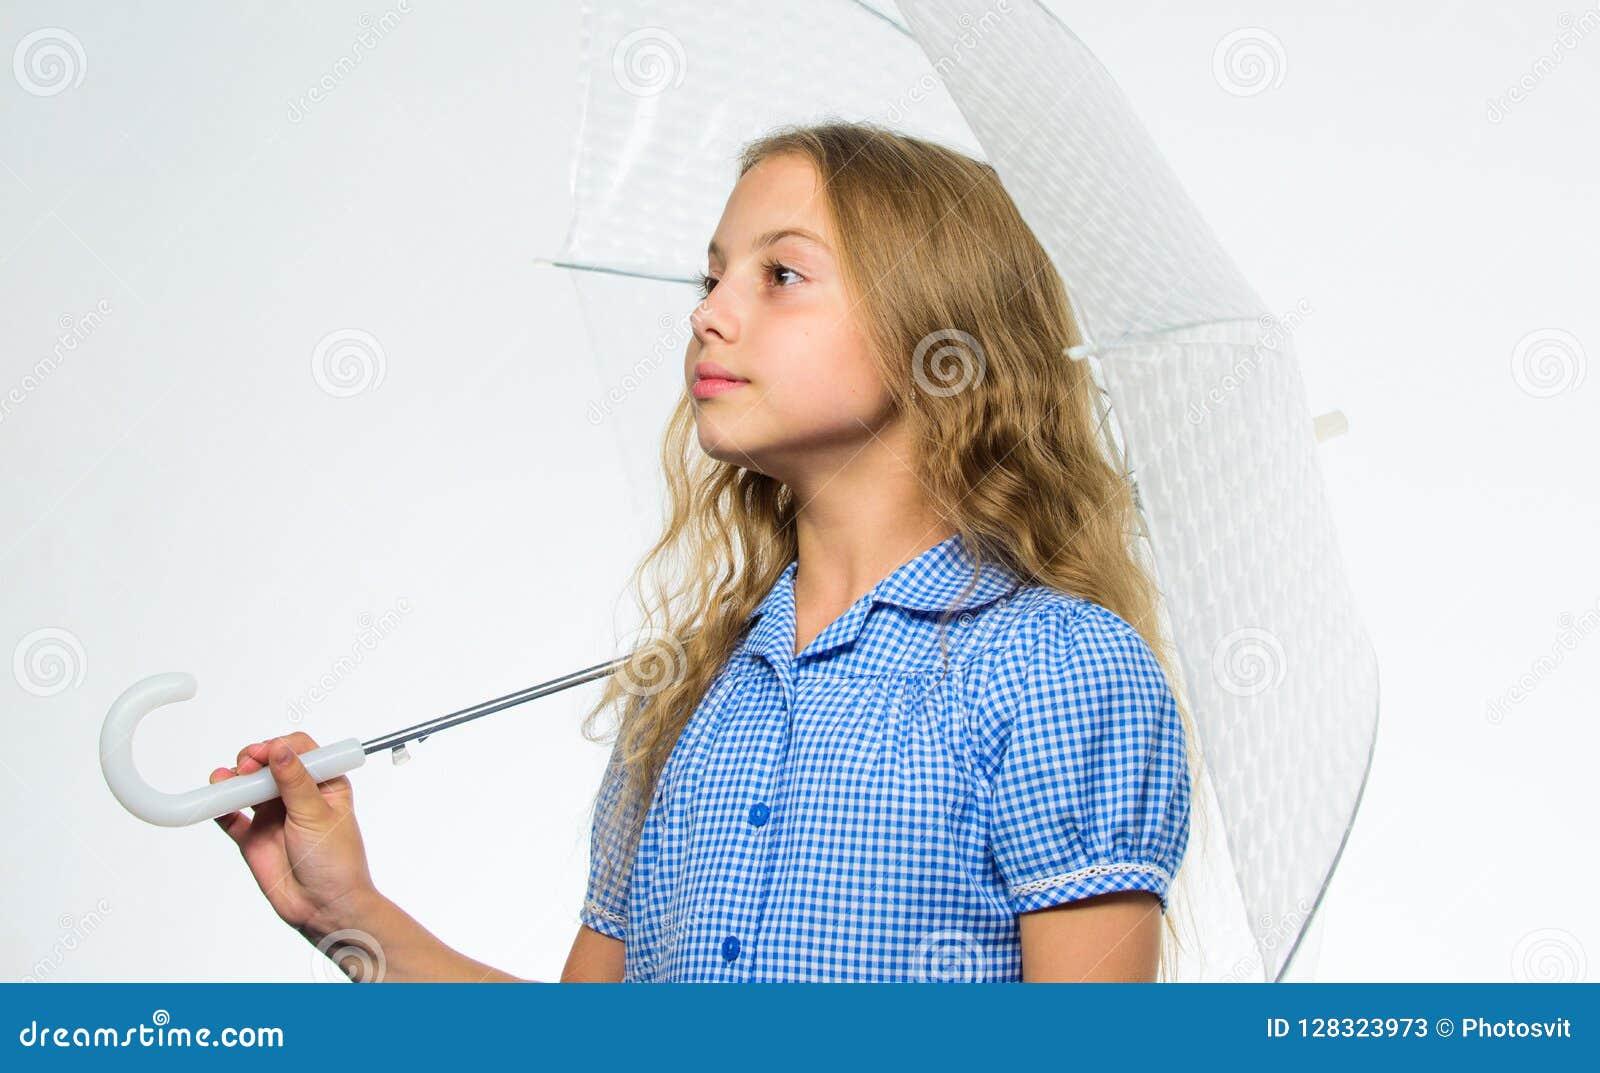 Beste dalings bijkomend concept Dalings regenachtig prettig weer Klaar meisjes het kind ontmoet dalingsweer met transparante para